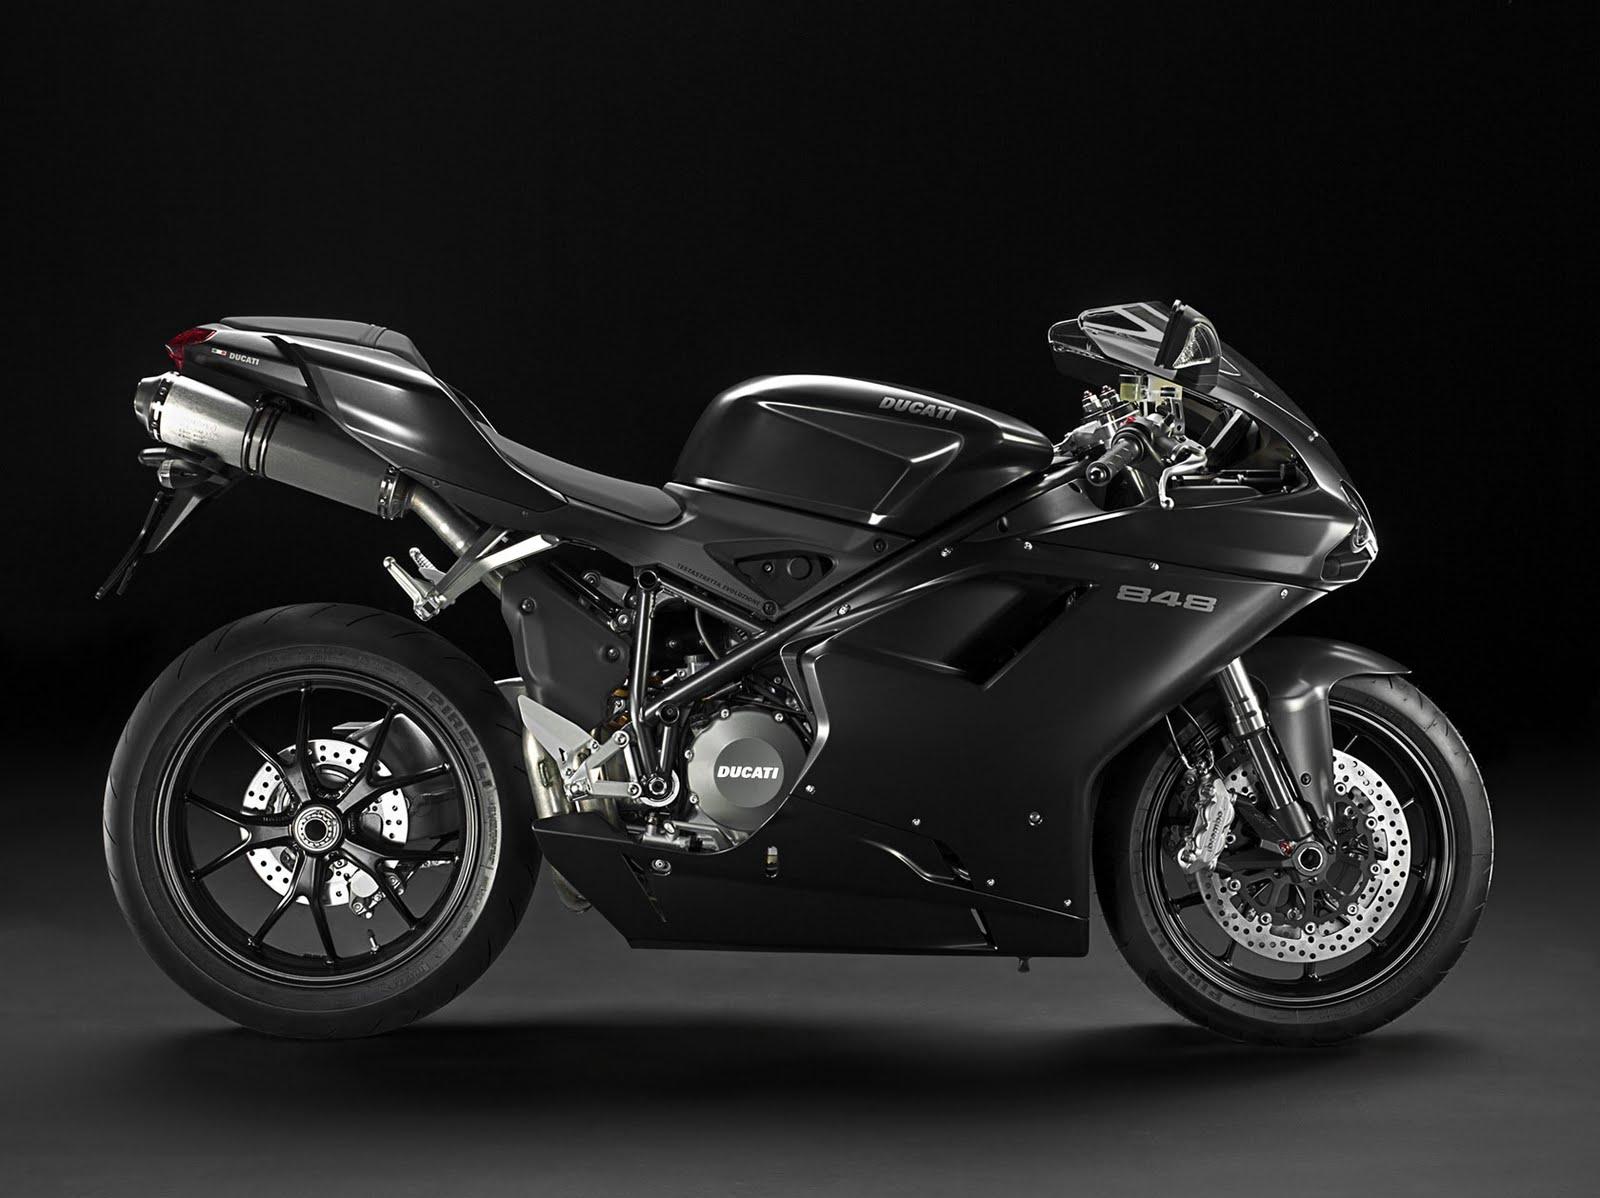 Best Motorcycle: 2010 Ducati 848